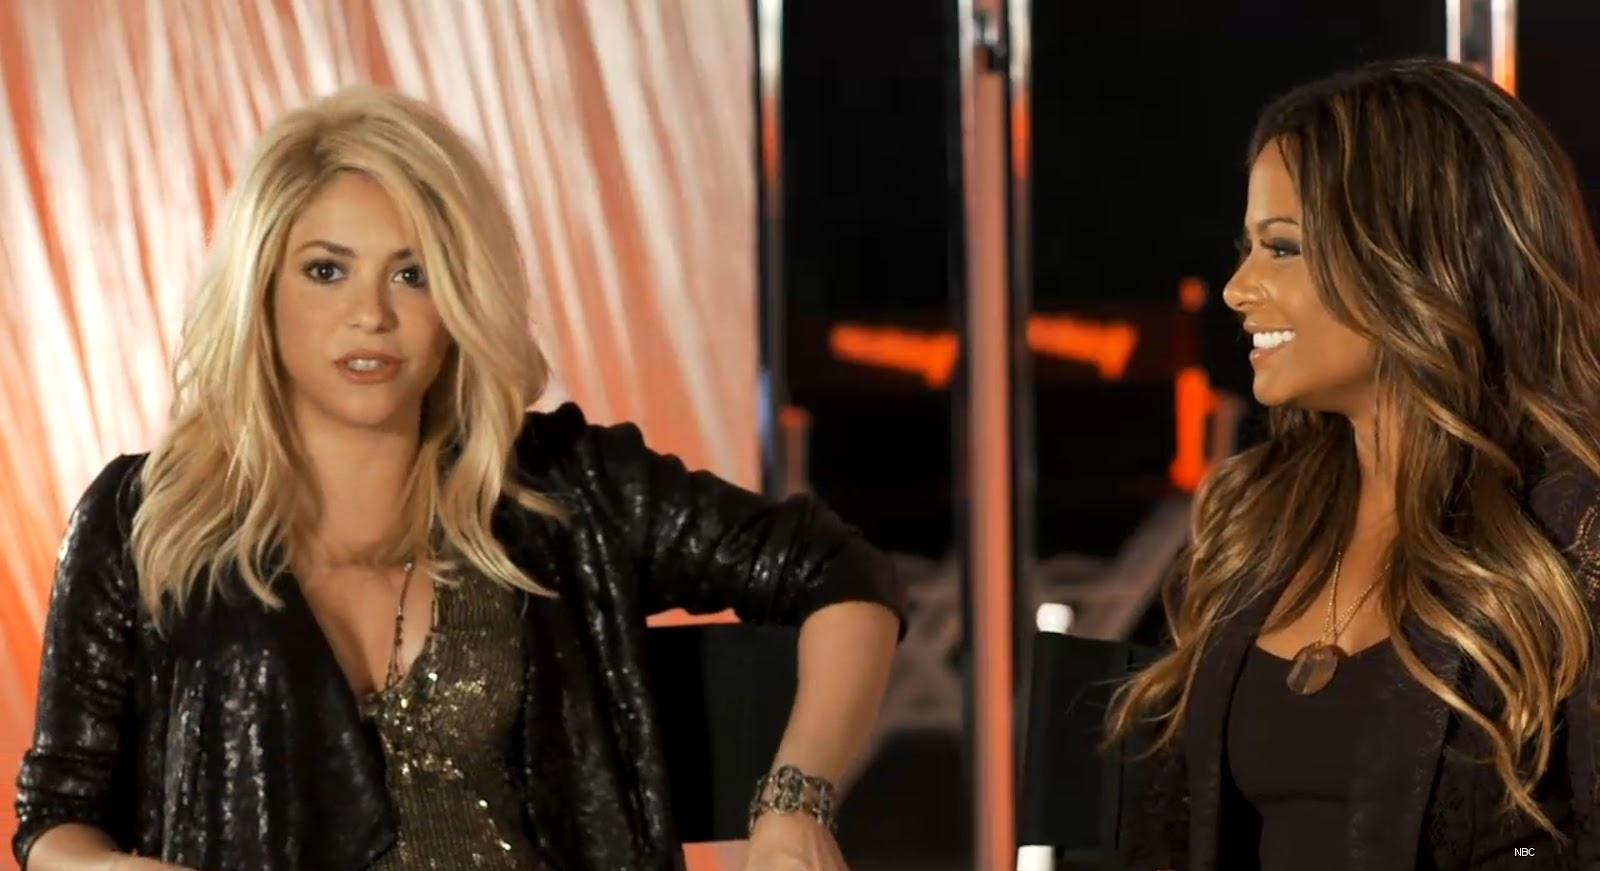 http://2.bp.blogspot.com/-W6xQUwlY-CY/UR7CmxjWYVI/AAAAAAAABAg/ejQ7KONbYkY/s1600/The-Voice-Shakira_Christina-Milian.jpg